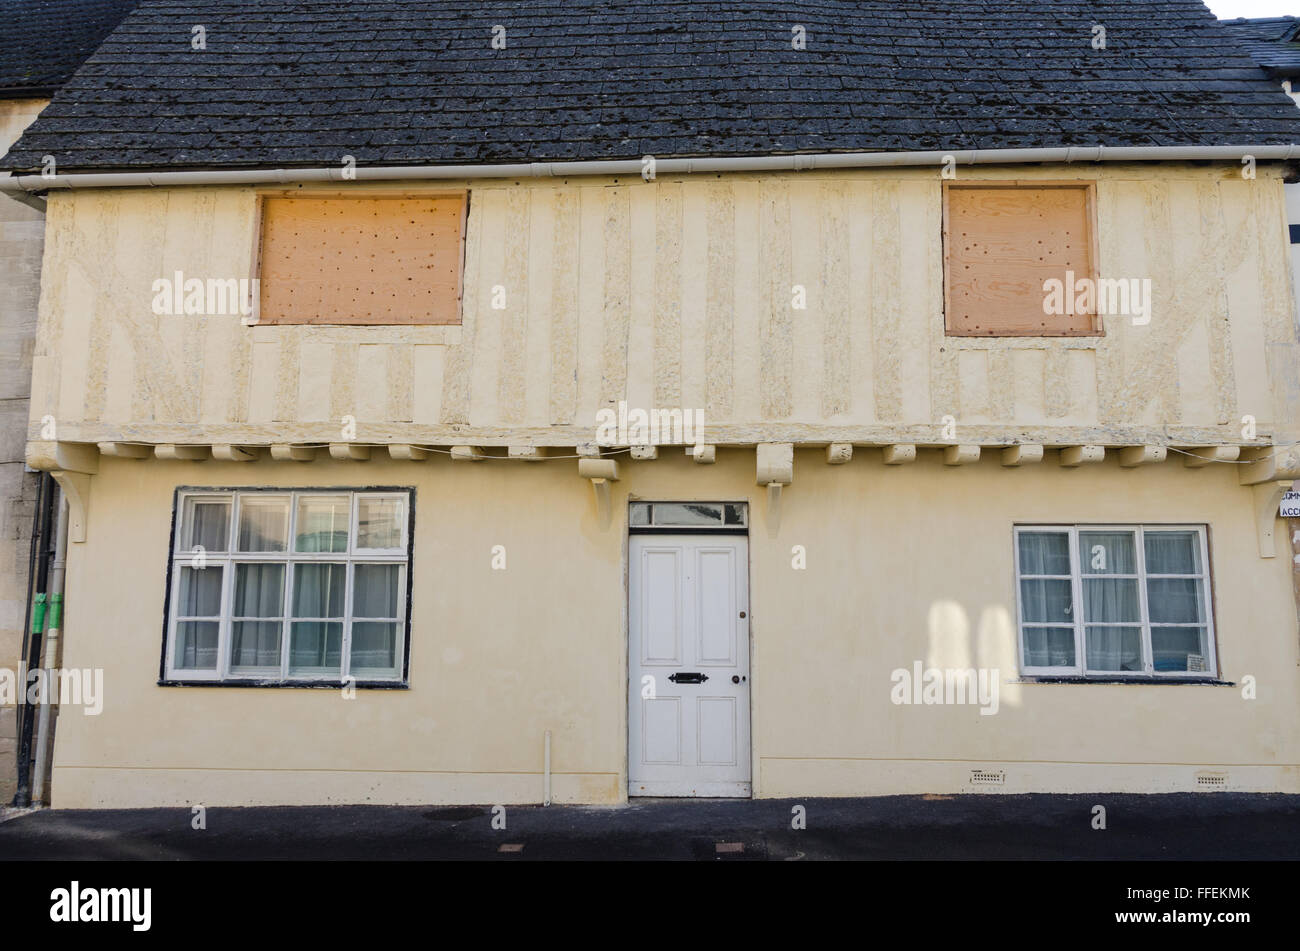 Timber Cottage Stockfotos & Timber Cottage Bilder - Alamy